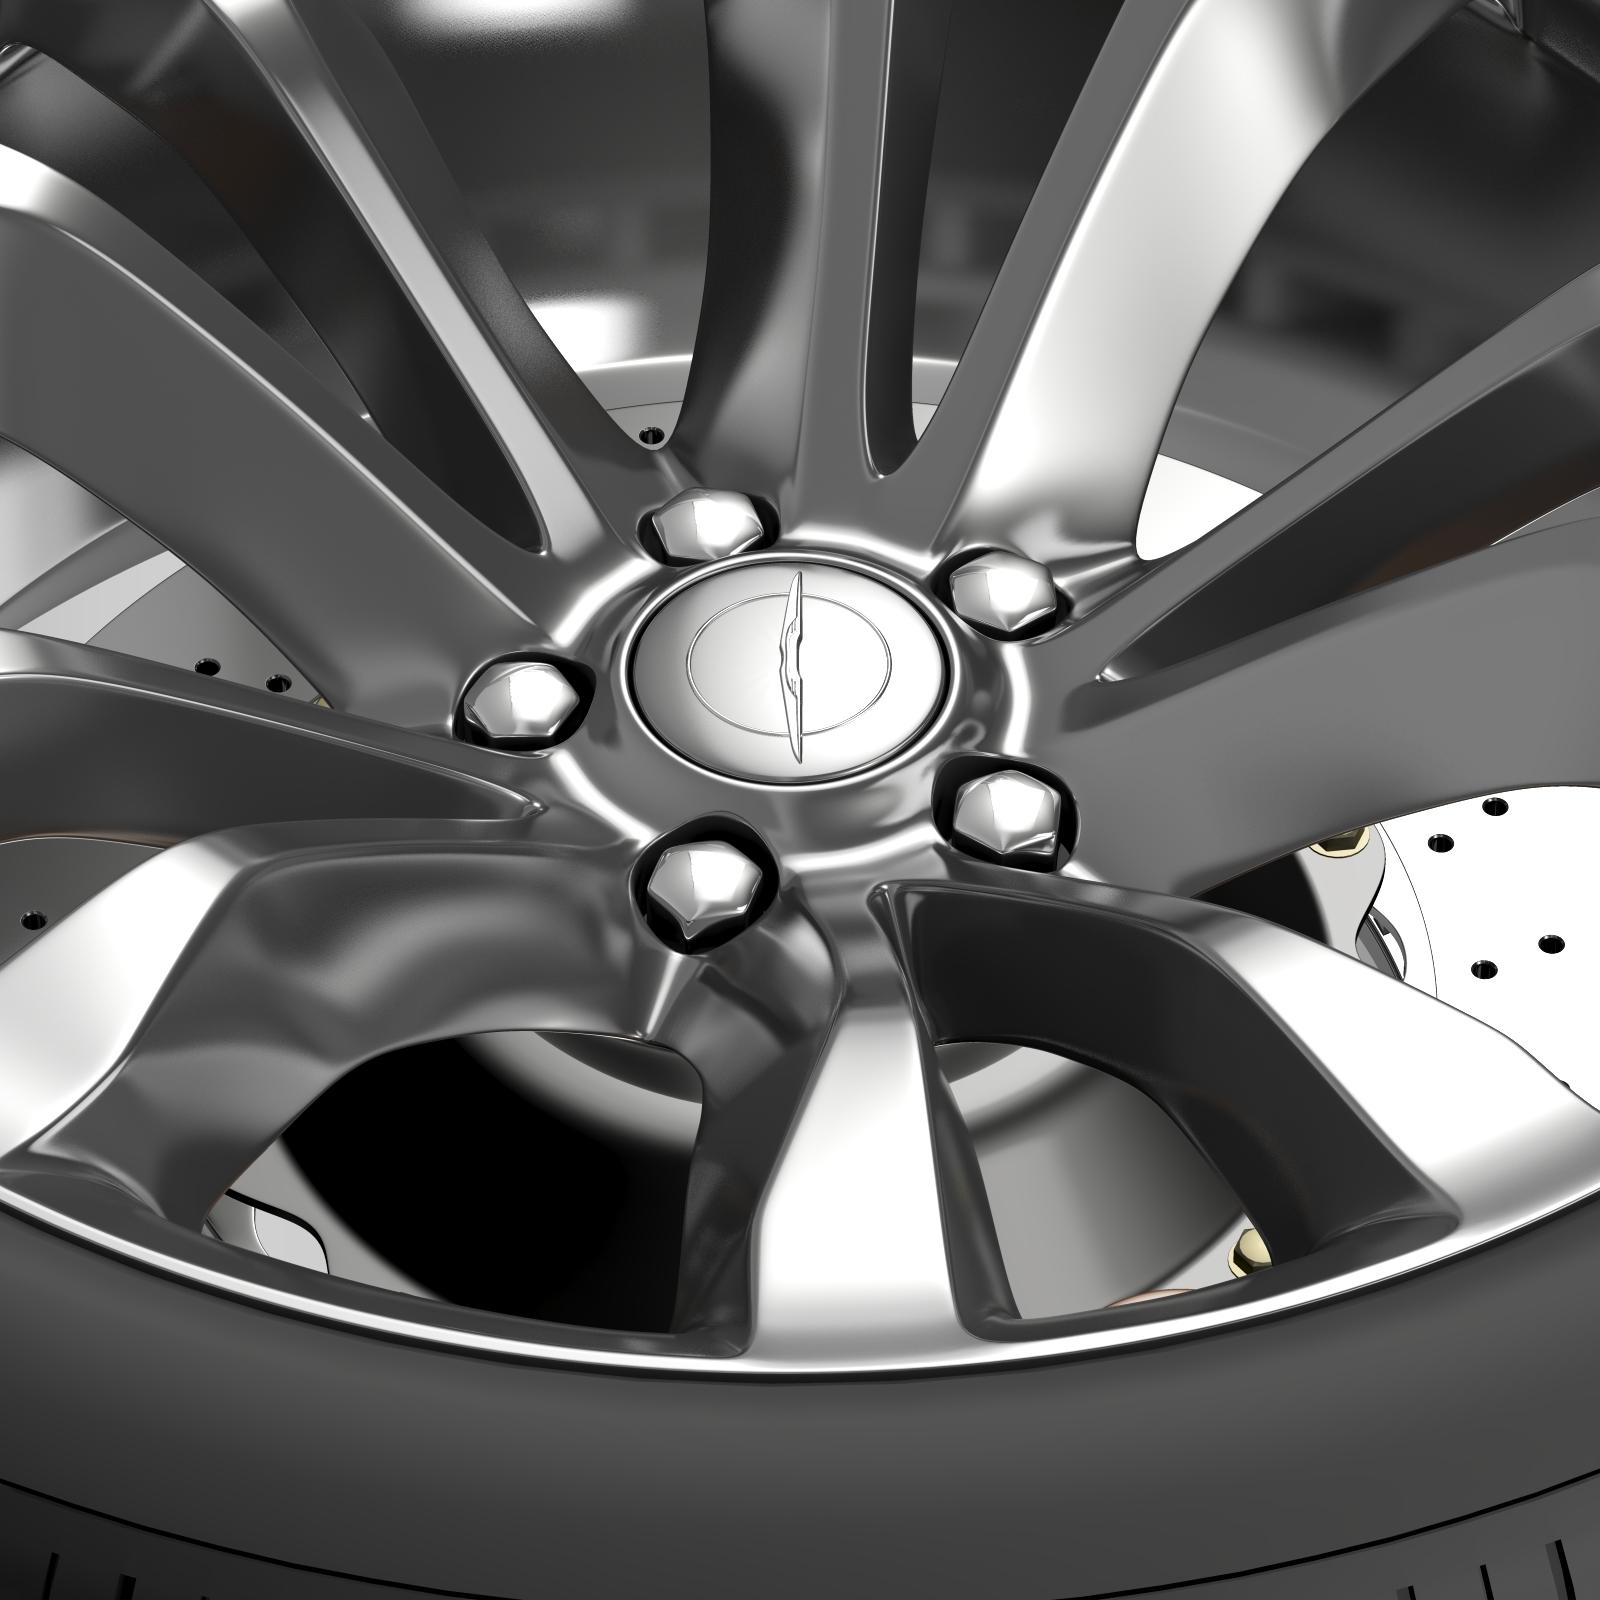 chrysler 300c platinum 2015 wheel 3d model 3ds max fbx c4d lwo ma mb hrc xsi obj 212779